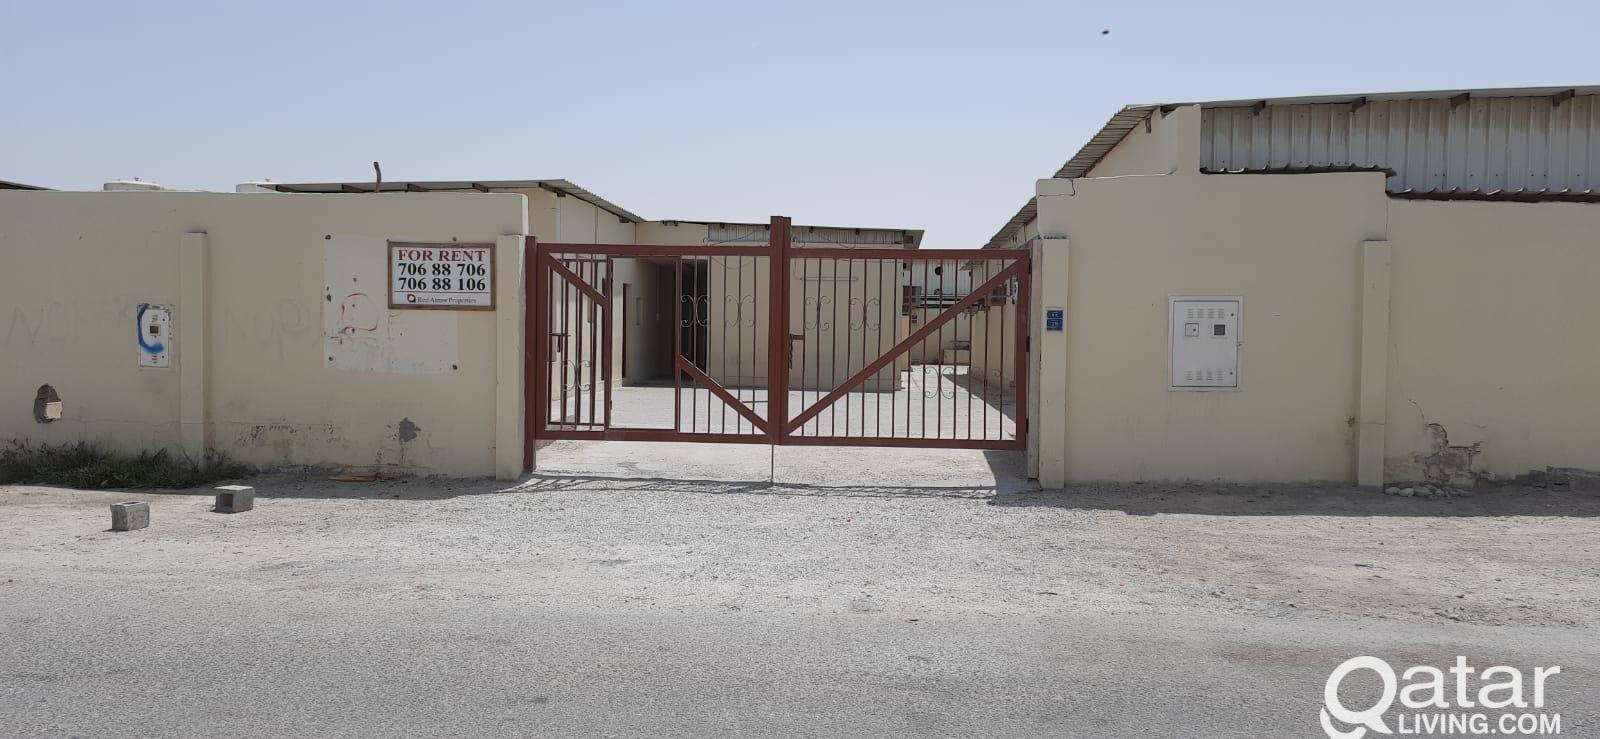 23 ROOMS LABOUR CAMP FOR RENT - Al Khor Industrial